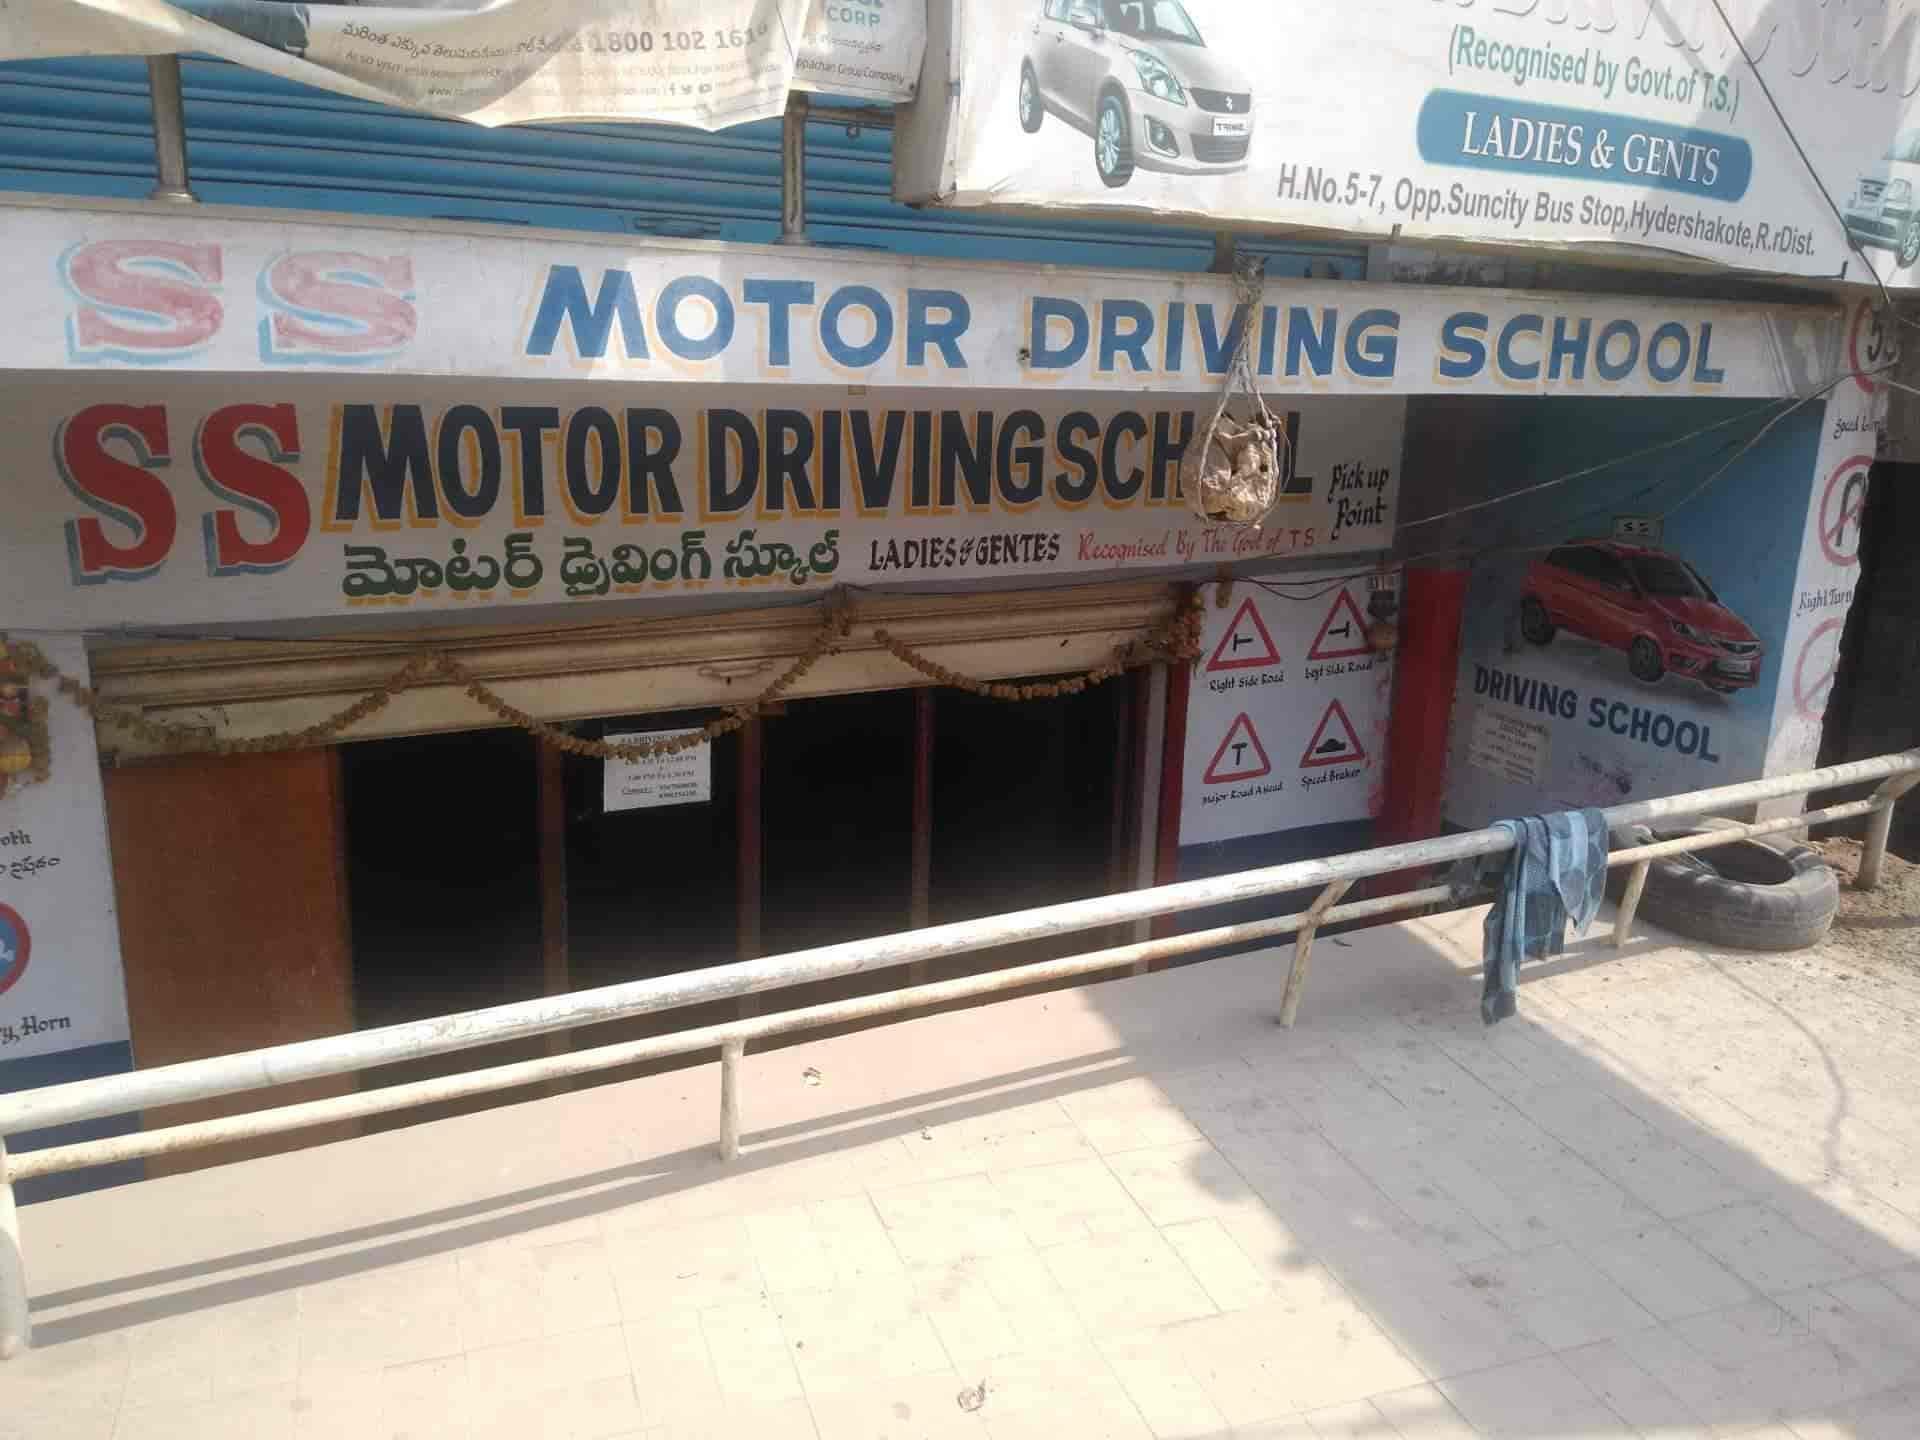 Ss Motor Driving School Photos, Suncity Langar House, Hyderabad